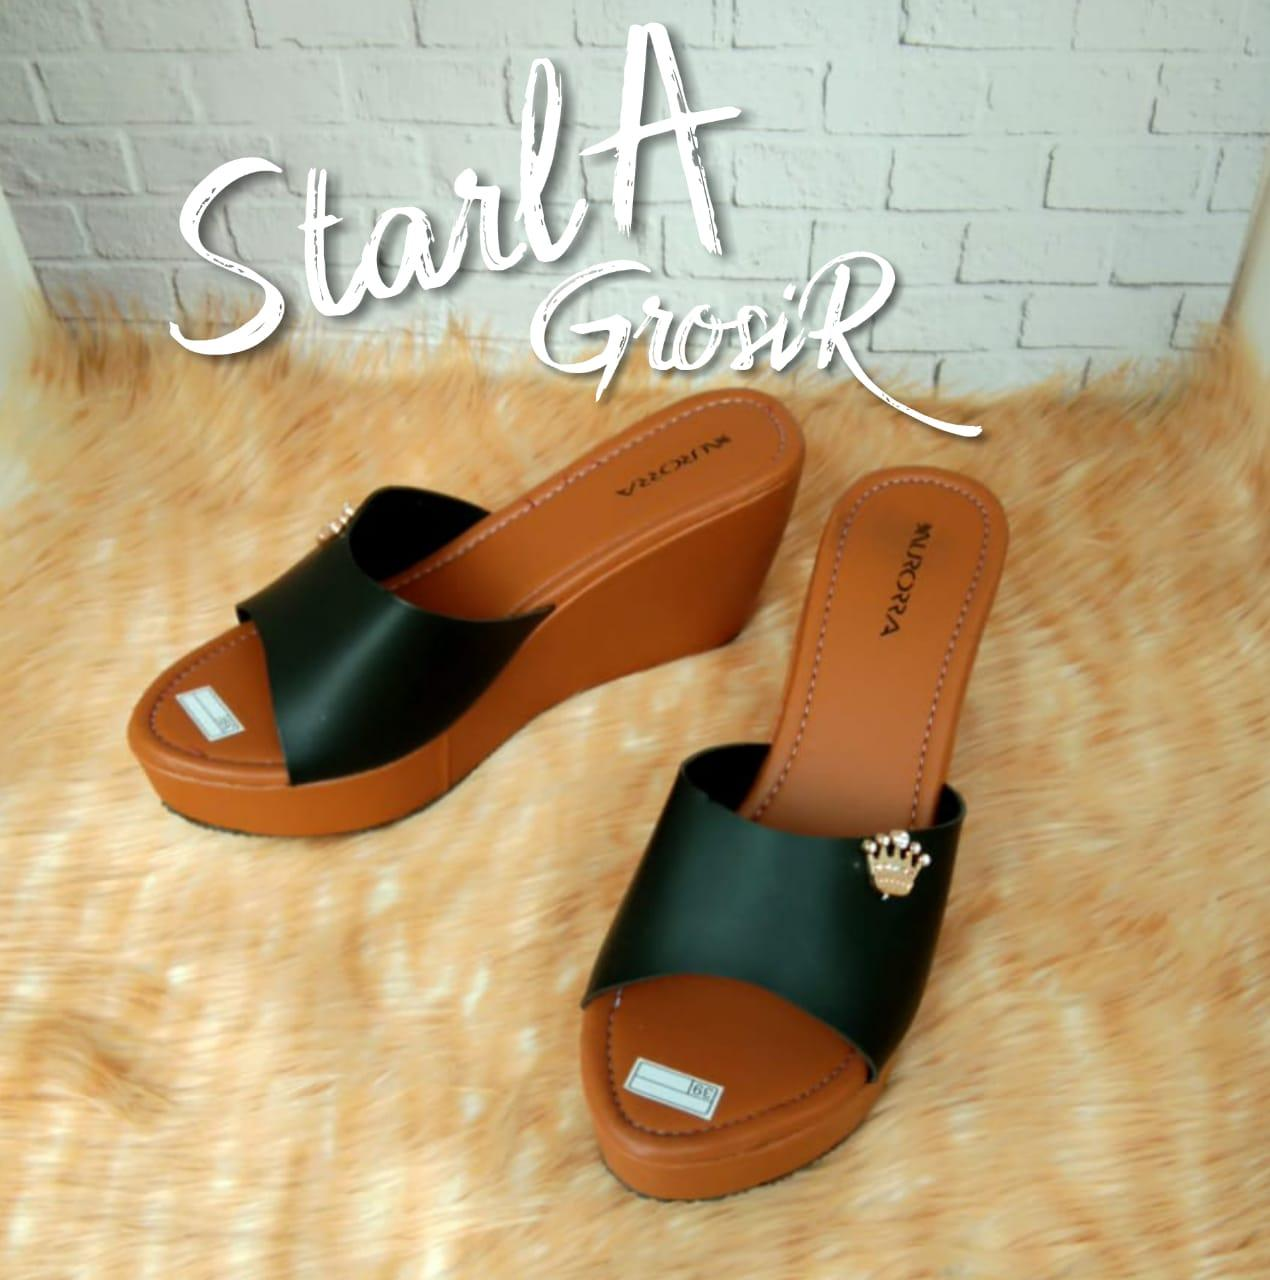 Starla Grosir - Sandal Wanita Wedges AS - 09